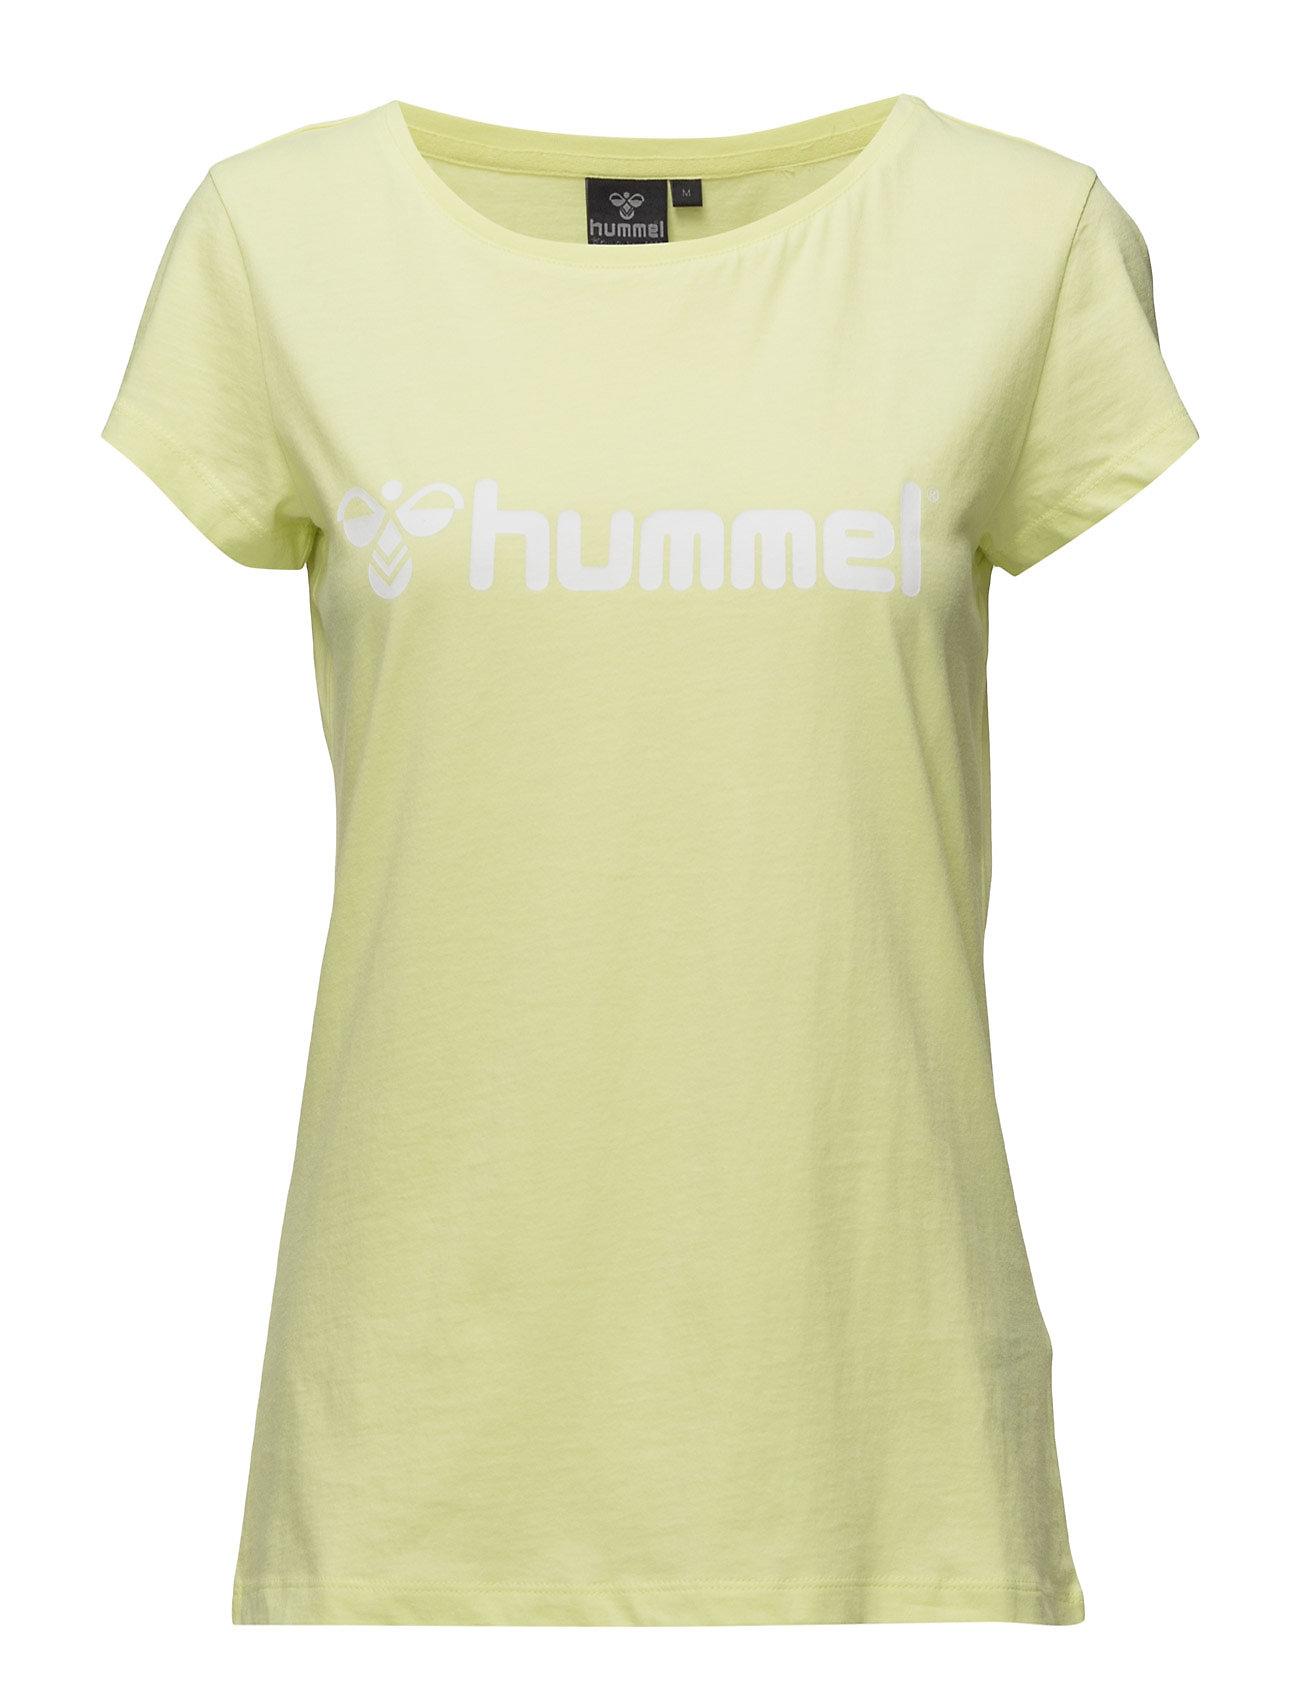 Classic Bee Womens Ss Tee Hummel Løbe t-shirts til Damer i